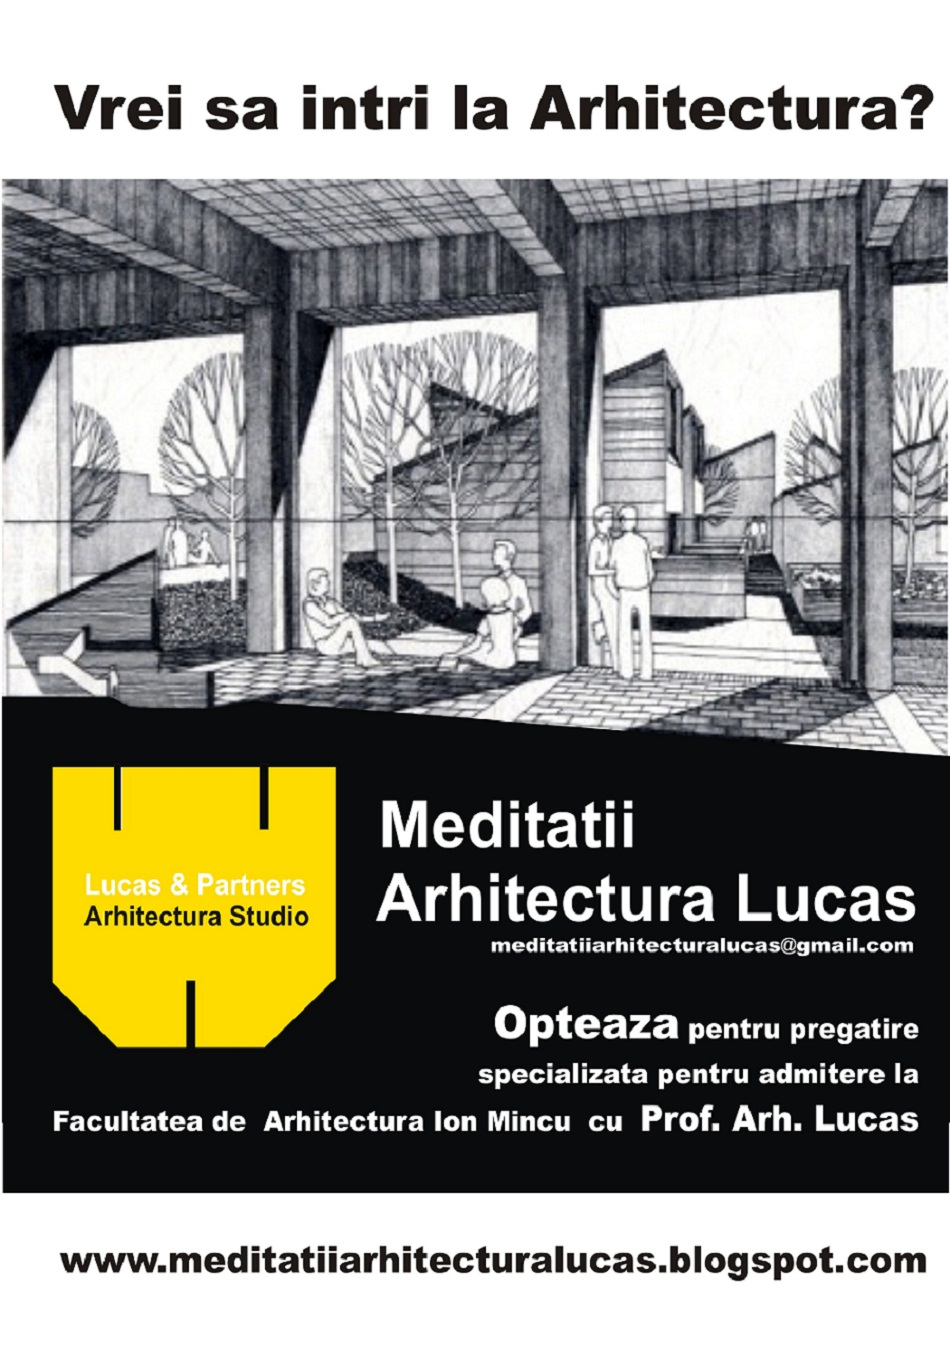 LUCAS STUDIO